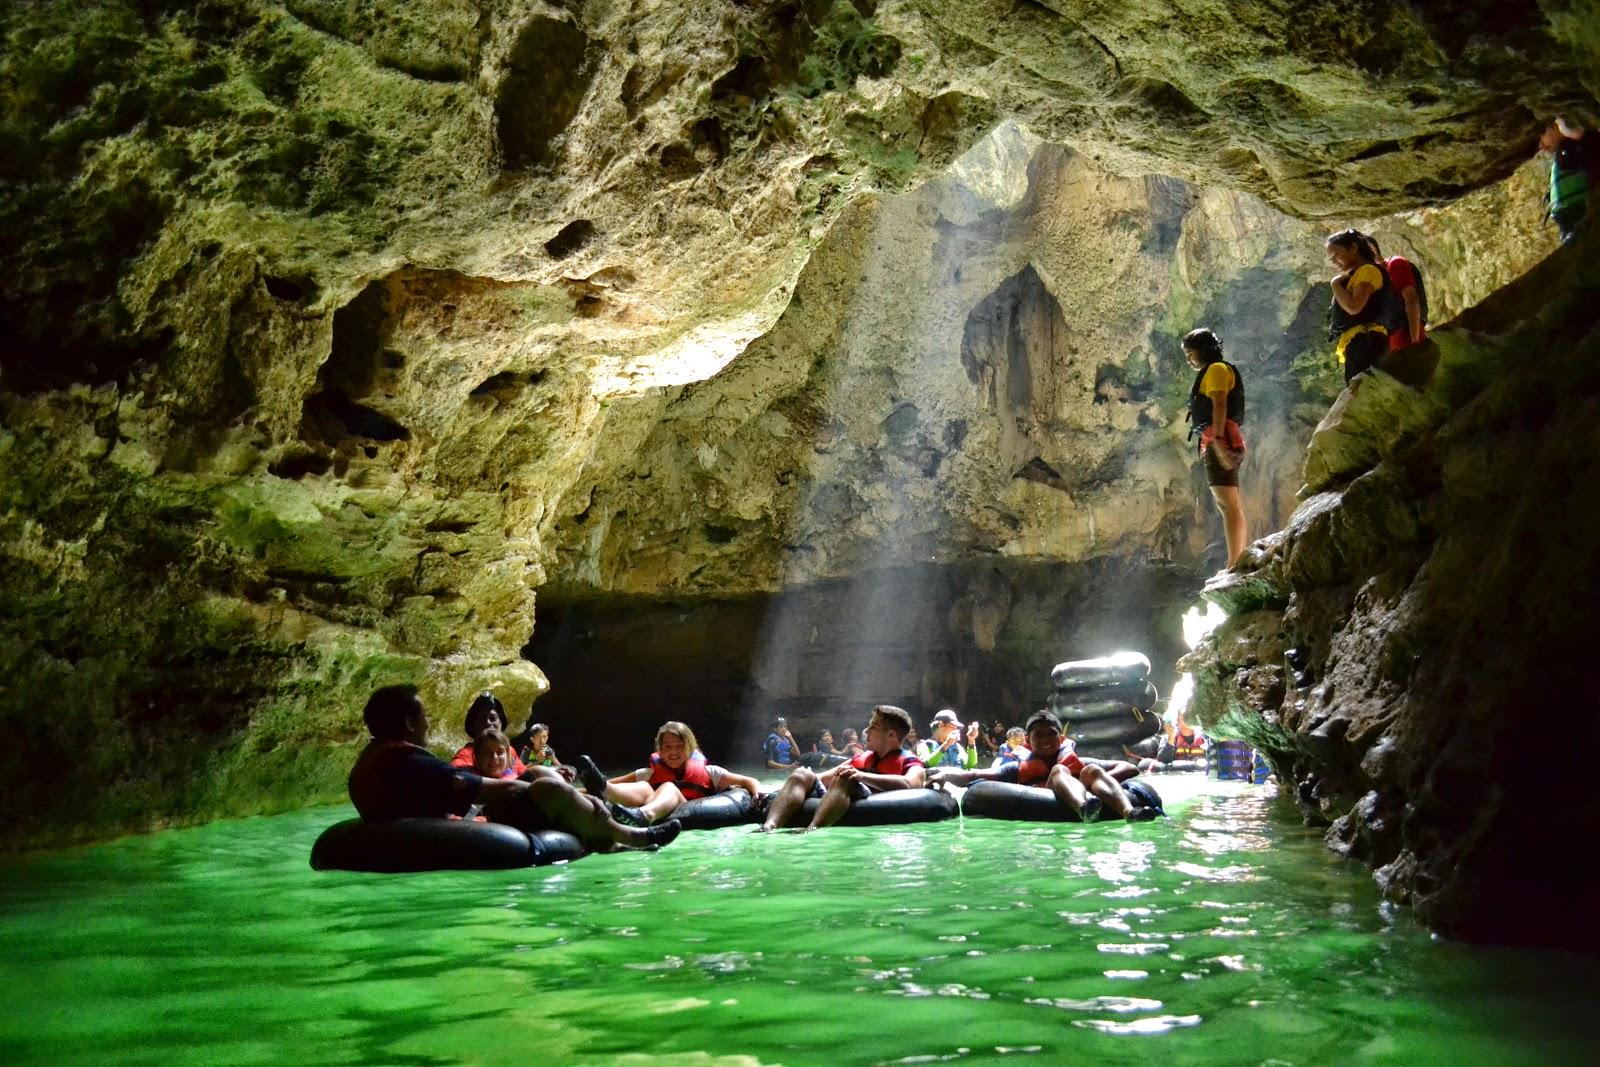 wisata asli jogja berikut tempat wisata gua di jogja yang sangat indah